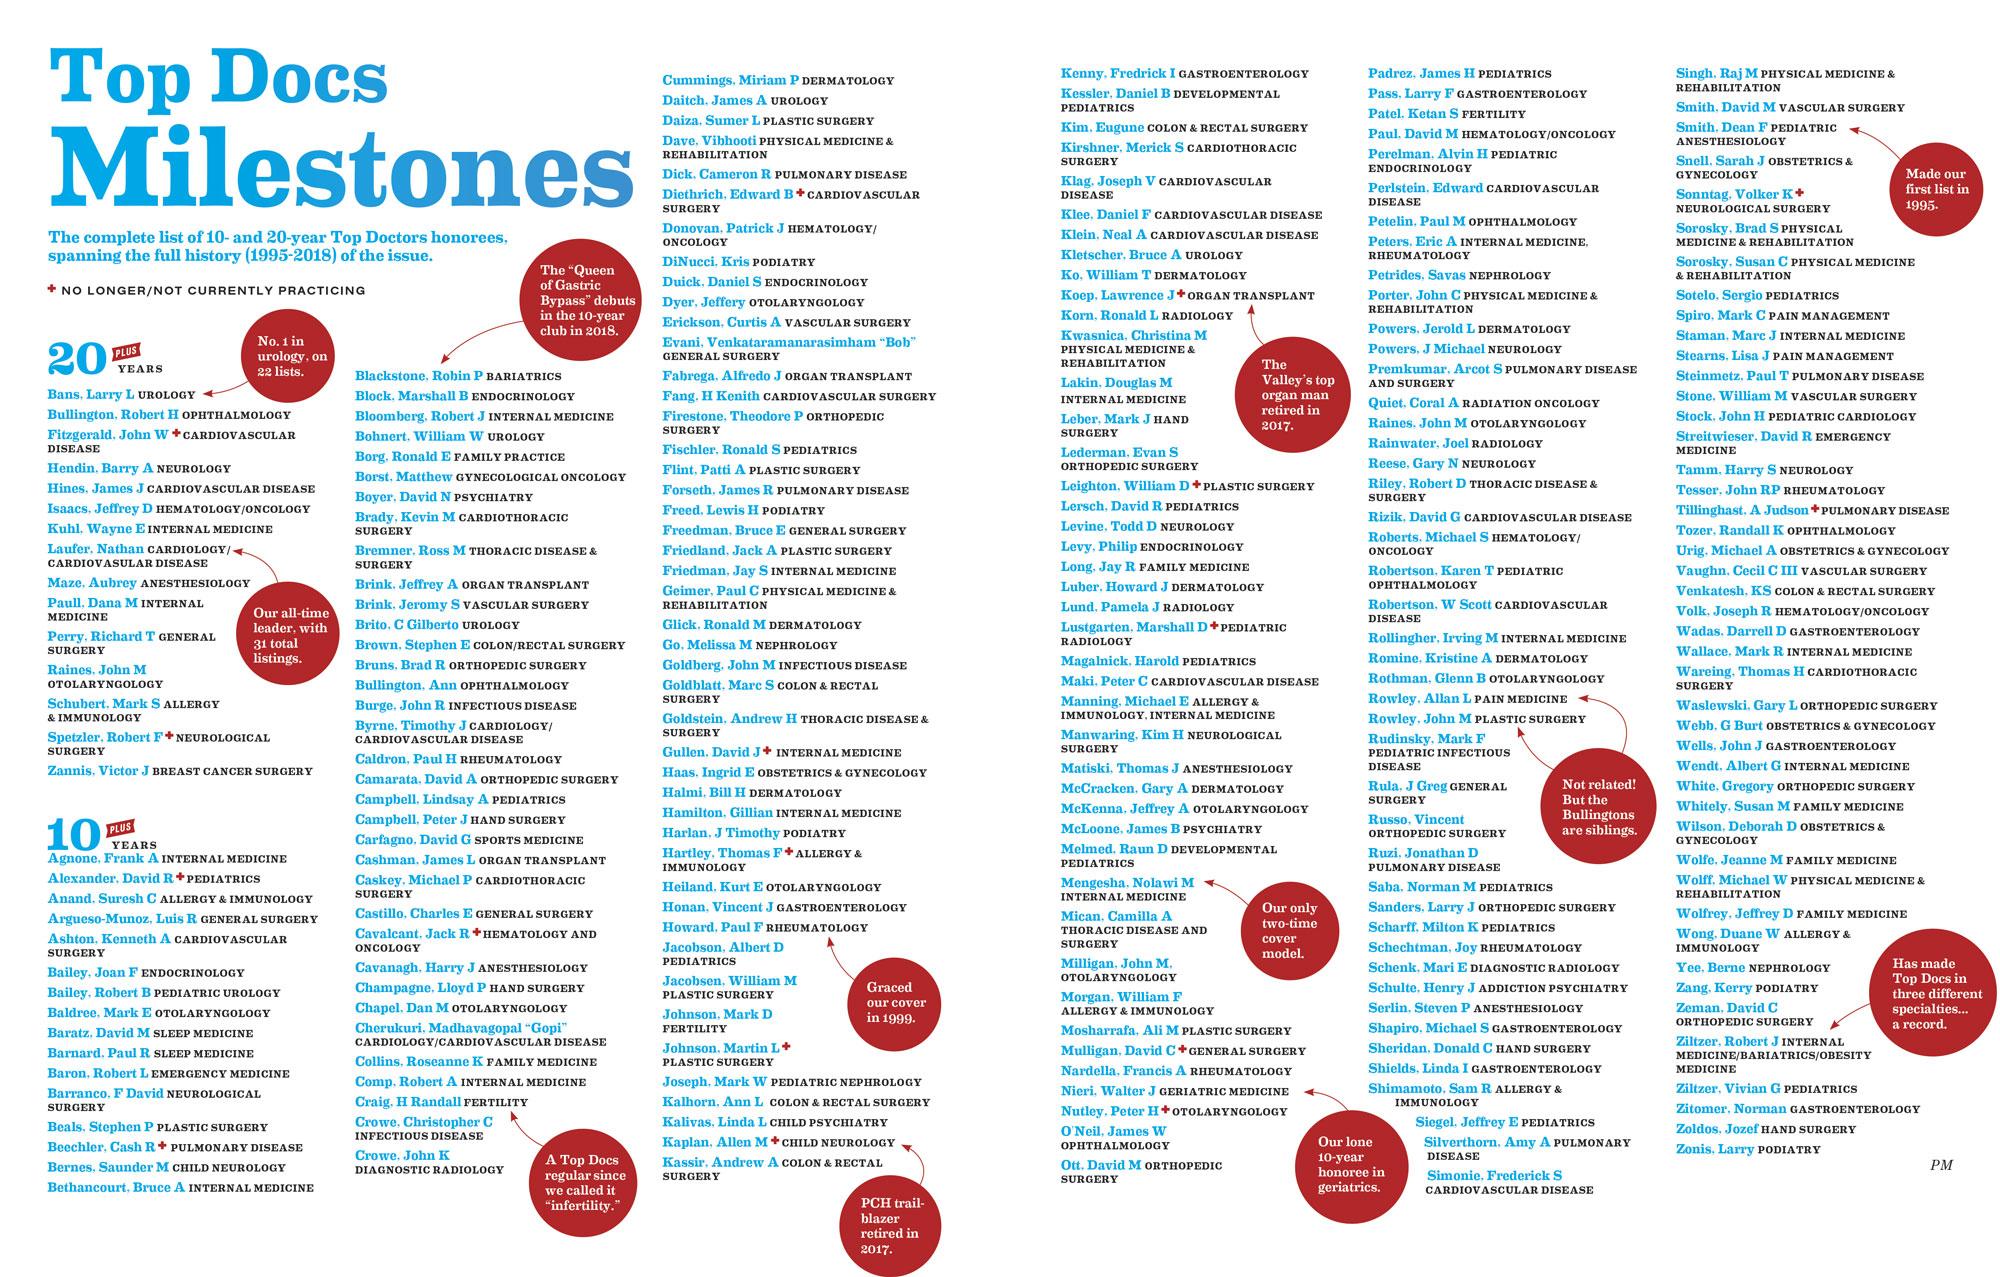 Top Docs Milestones